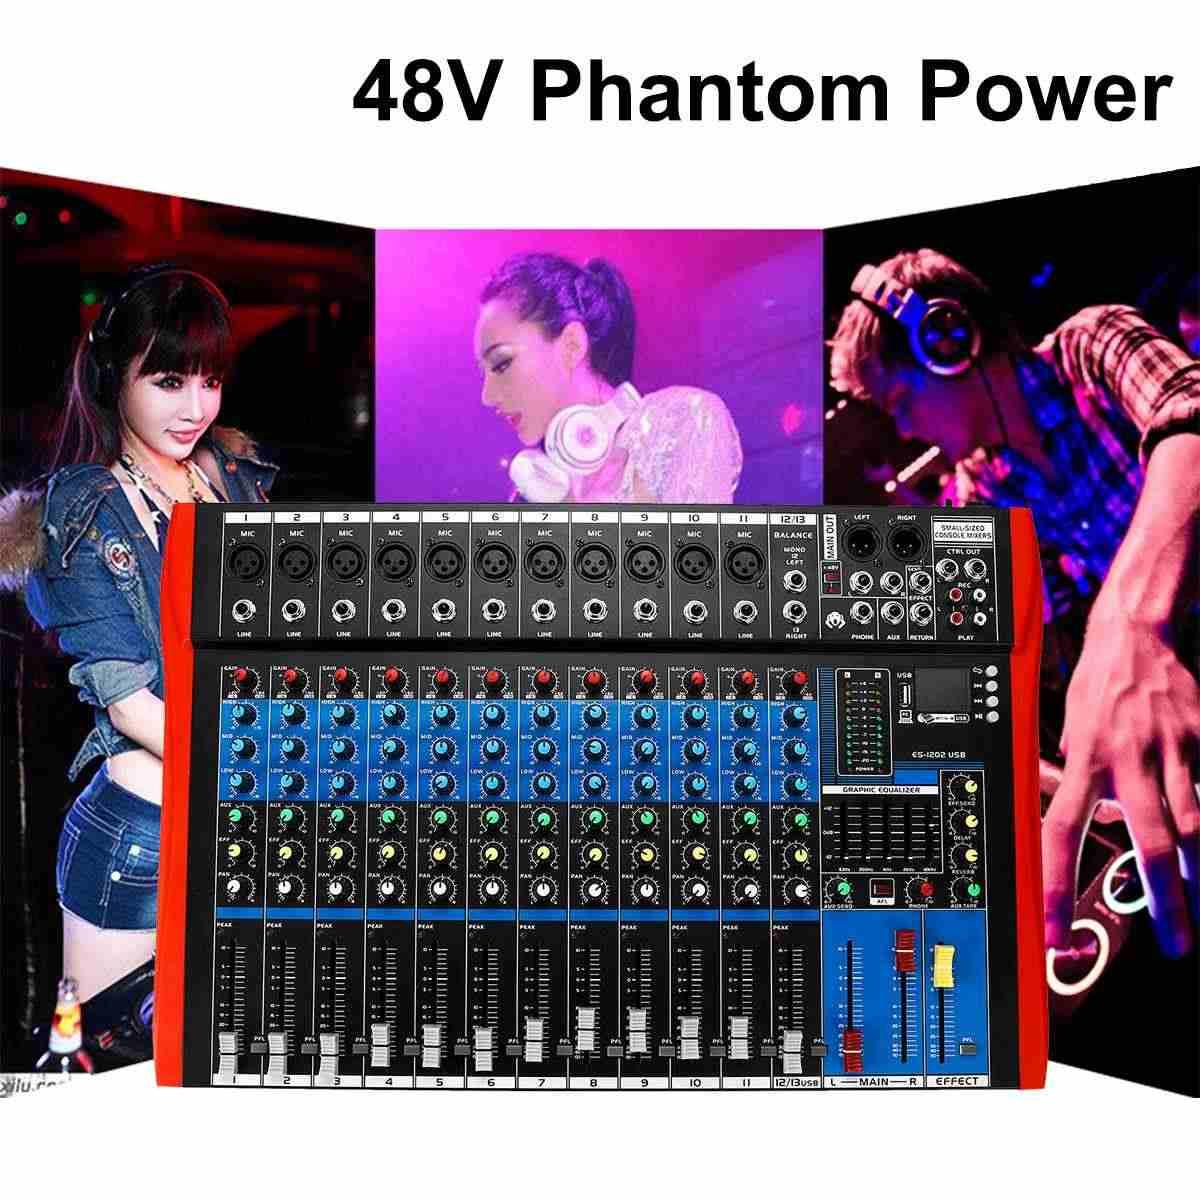 48V オーディオミキサー usb プロ 12 チャンネル bluetooth スタジオ Dj ミキシングコンソールカラオケアンプデジタル KTV サウンドミキサー